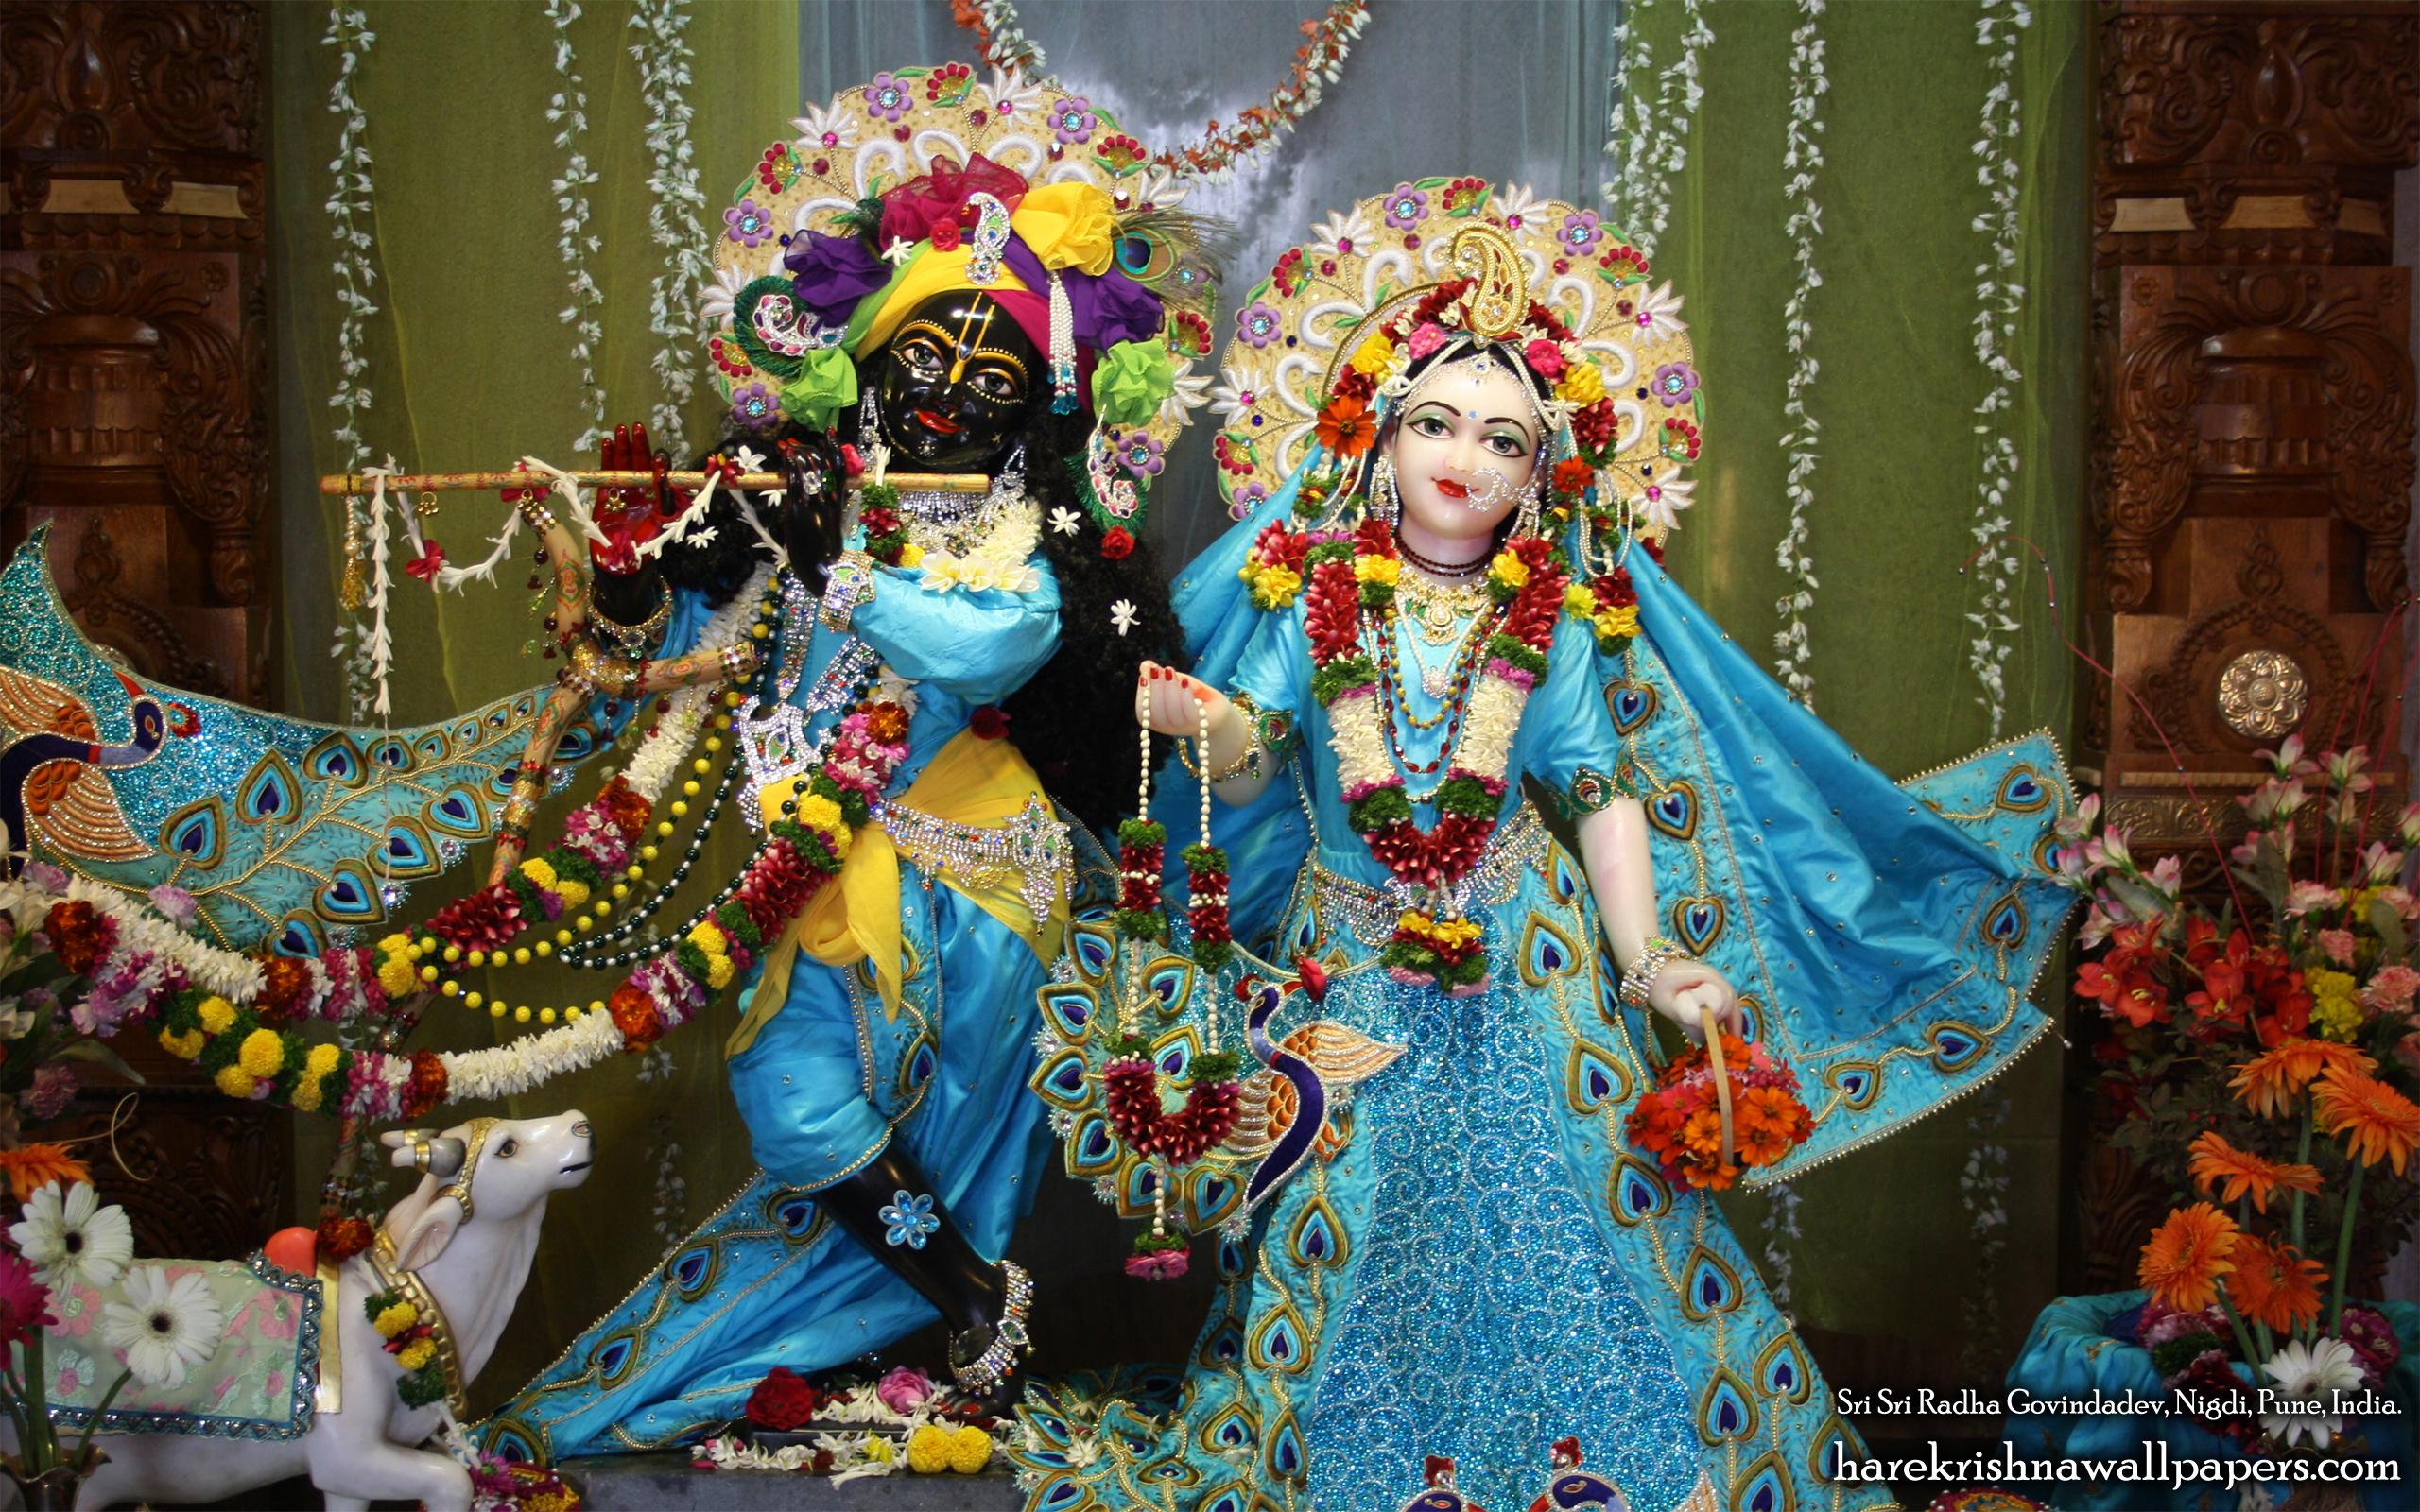 Sri Sri Radha Govind Wallpaper (021) Size 2560x1600 Download